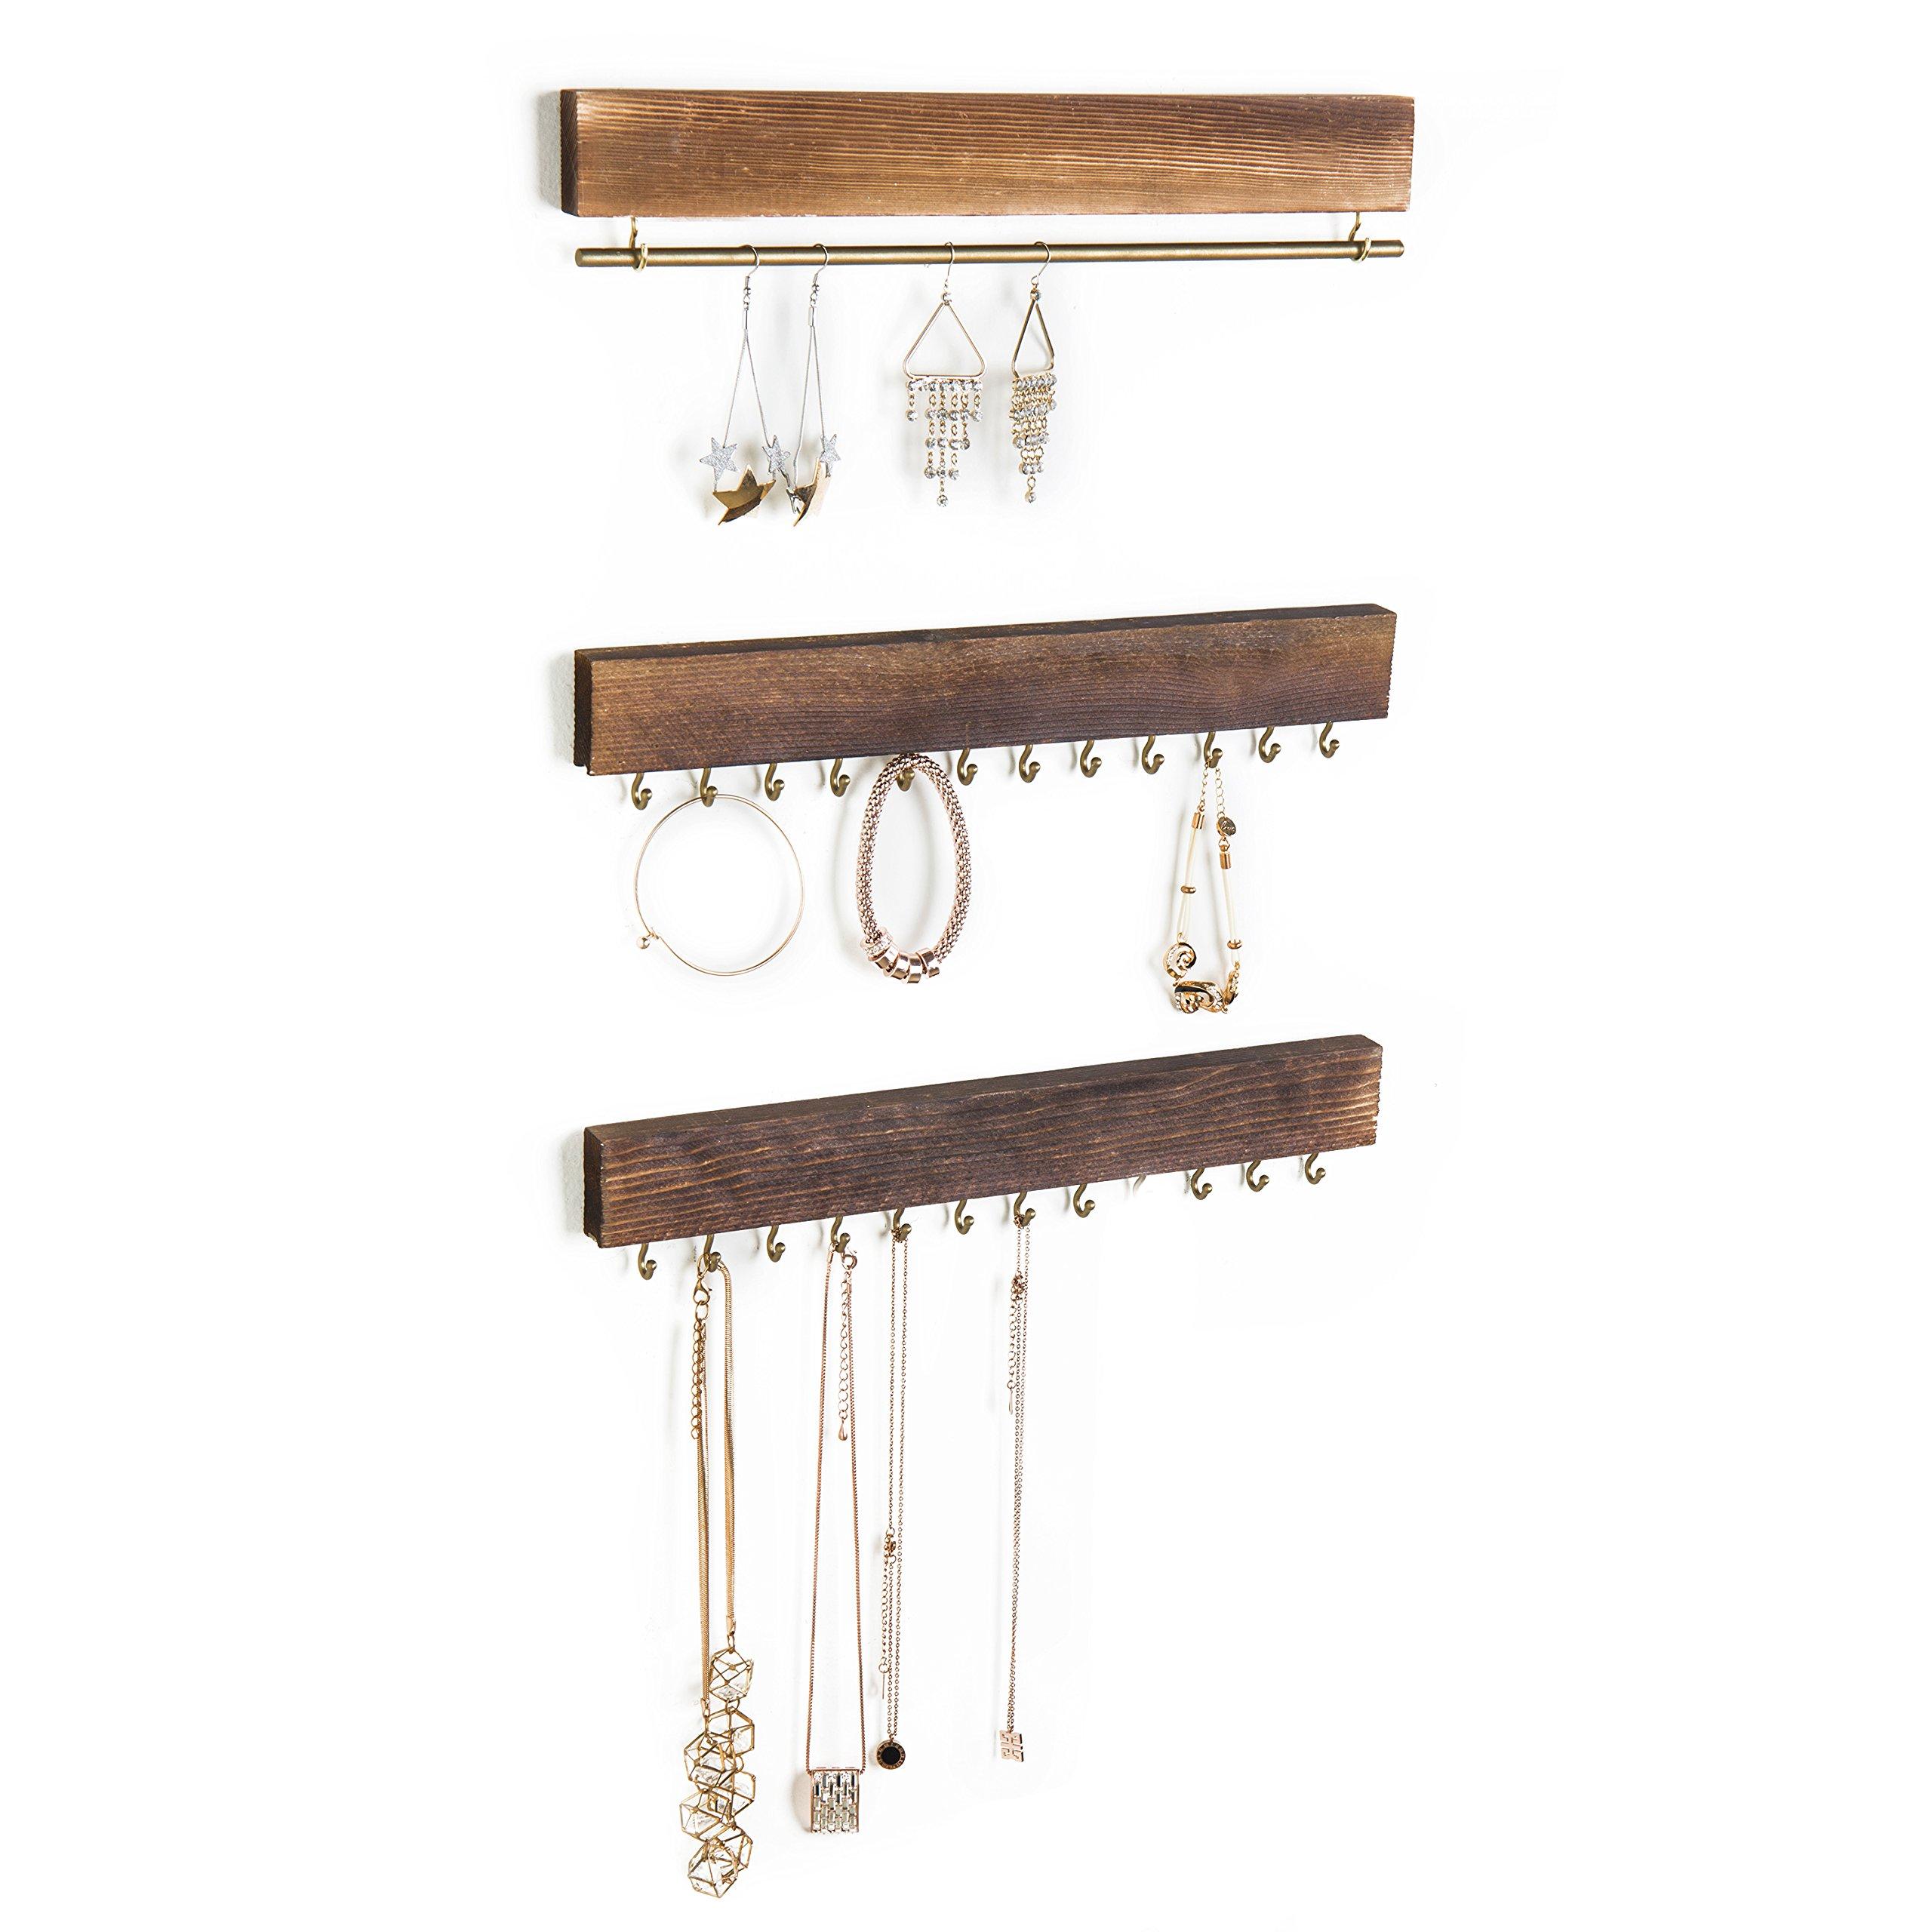 Set of 3 Rustic Wood & Gold Tone Metal Jewelry Organizers / Necklace & Bracelet Hook Racks / Earring Bar